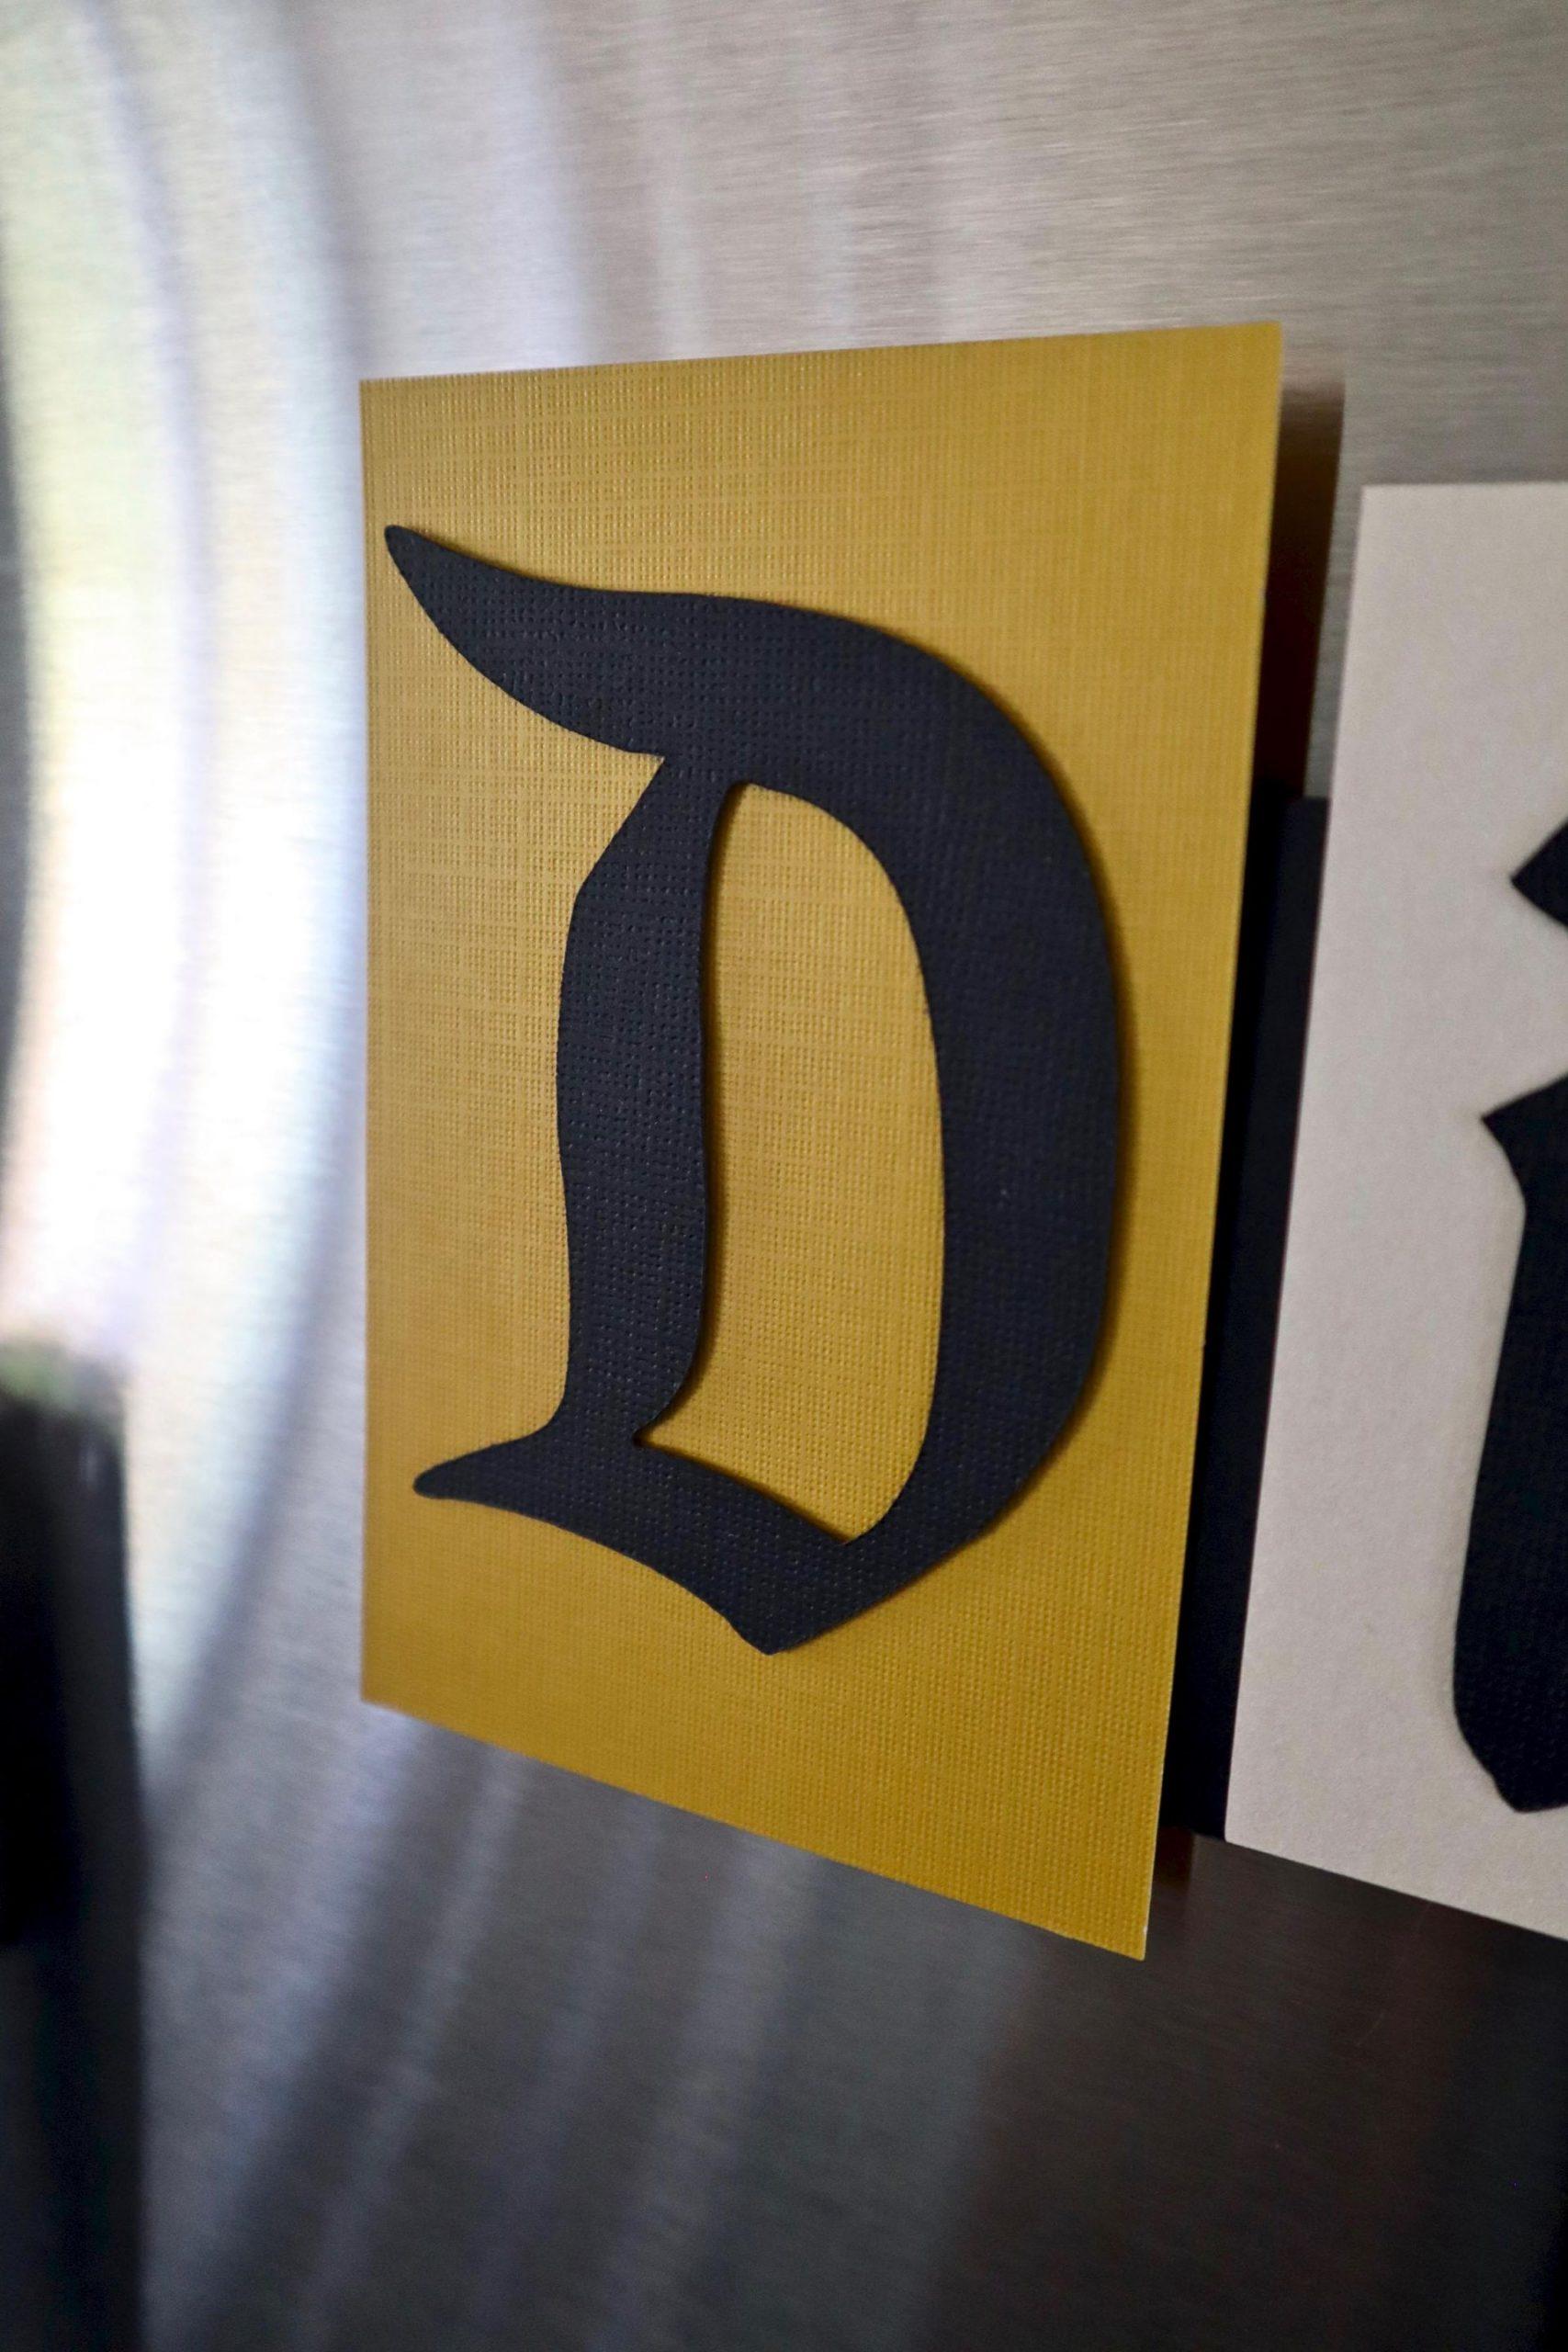 Diy Disneyland Wall Sign Or Magnet Disney Cricut Projects Popcorner Reviews